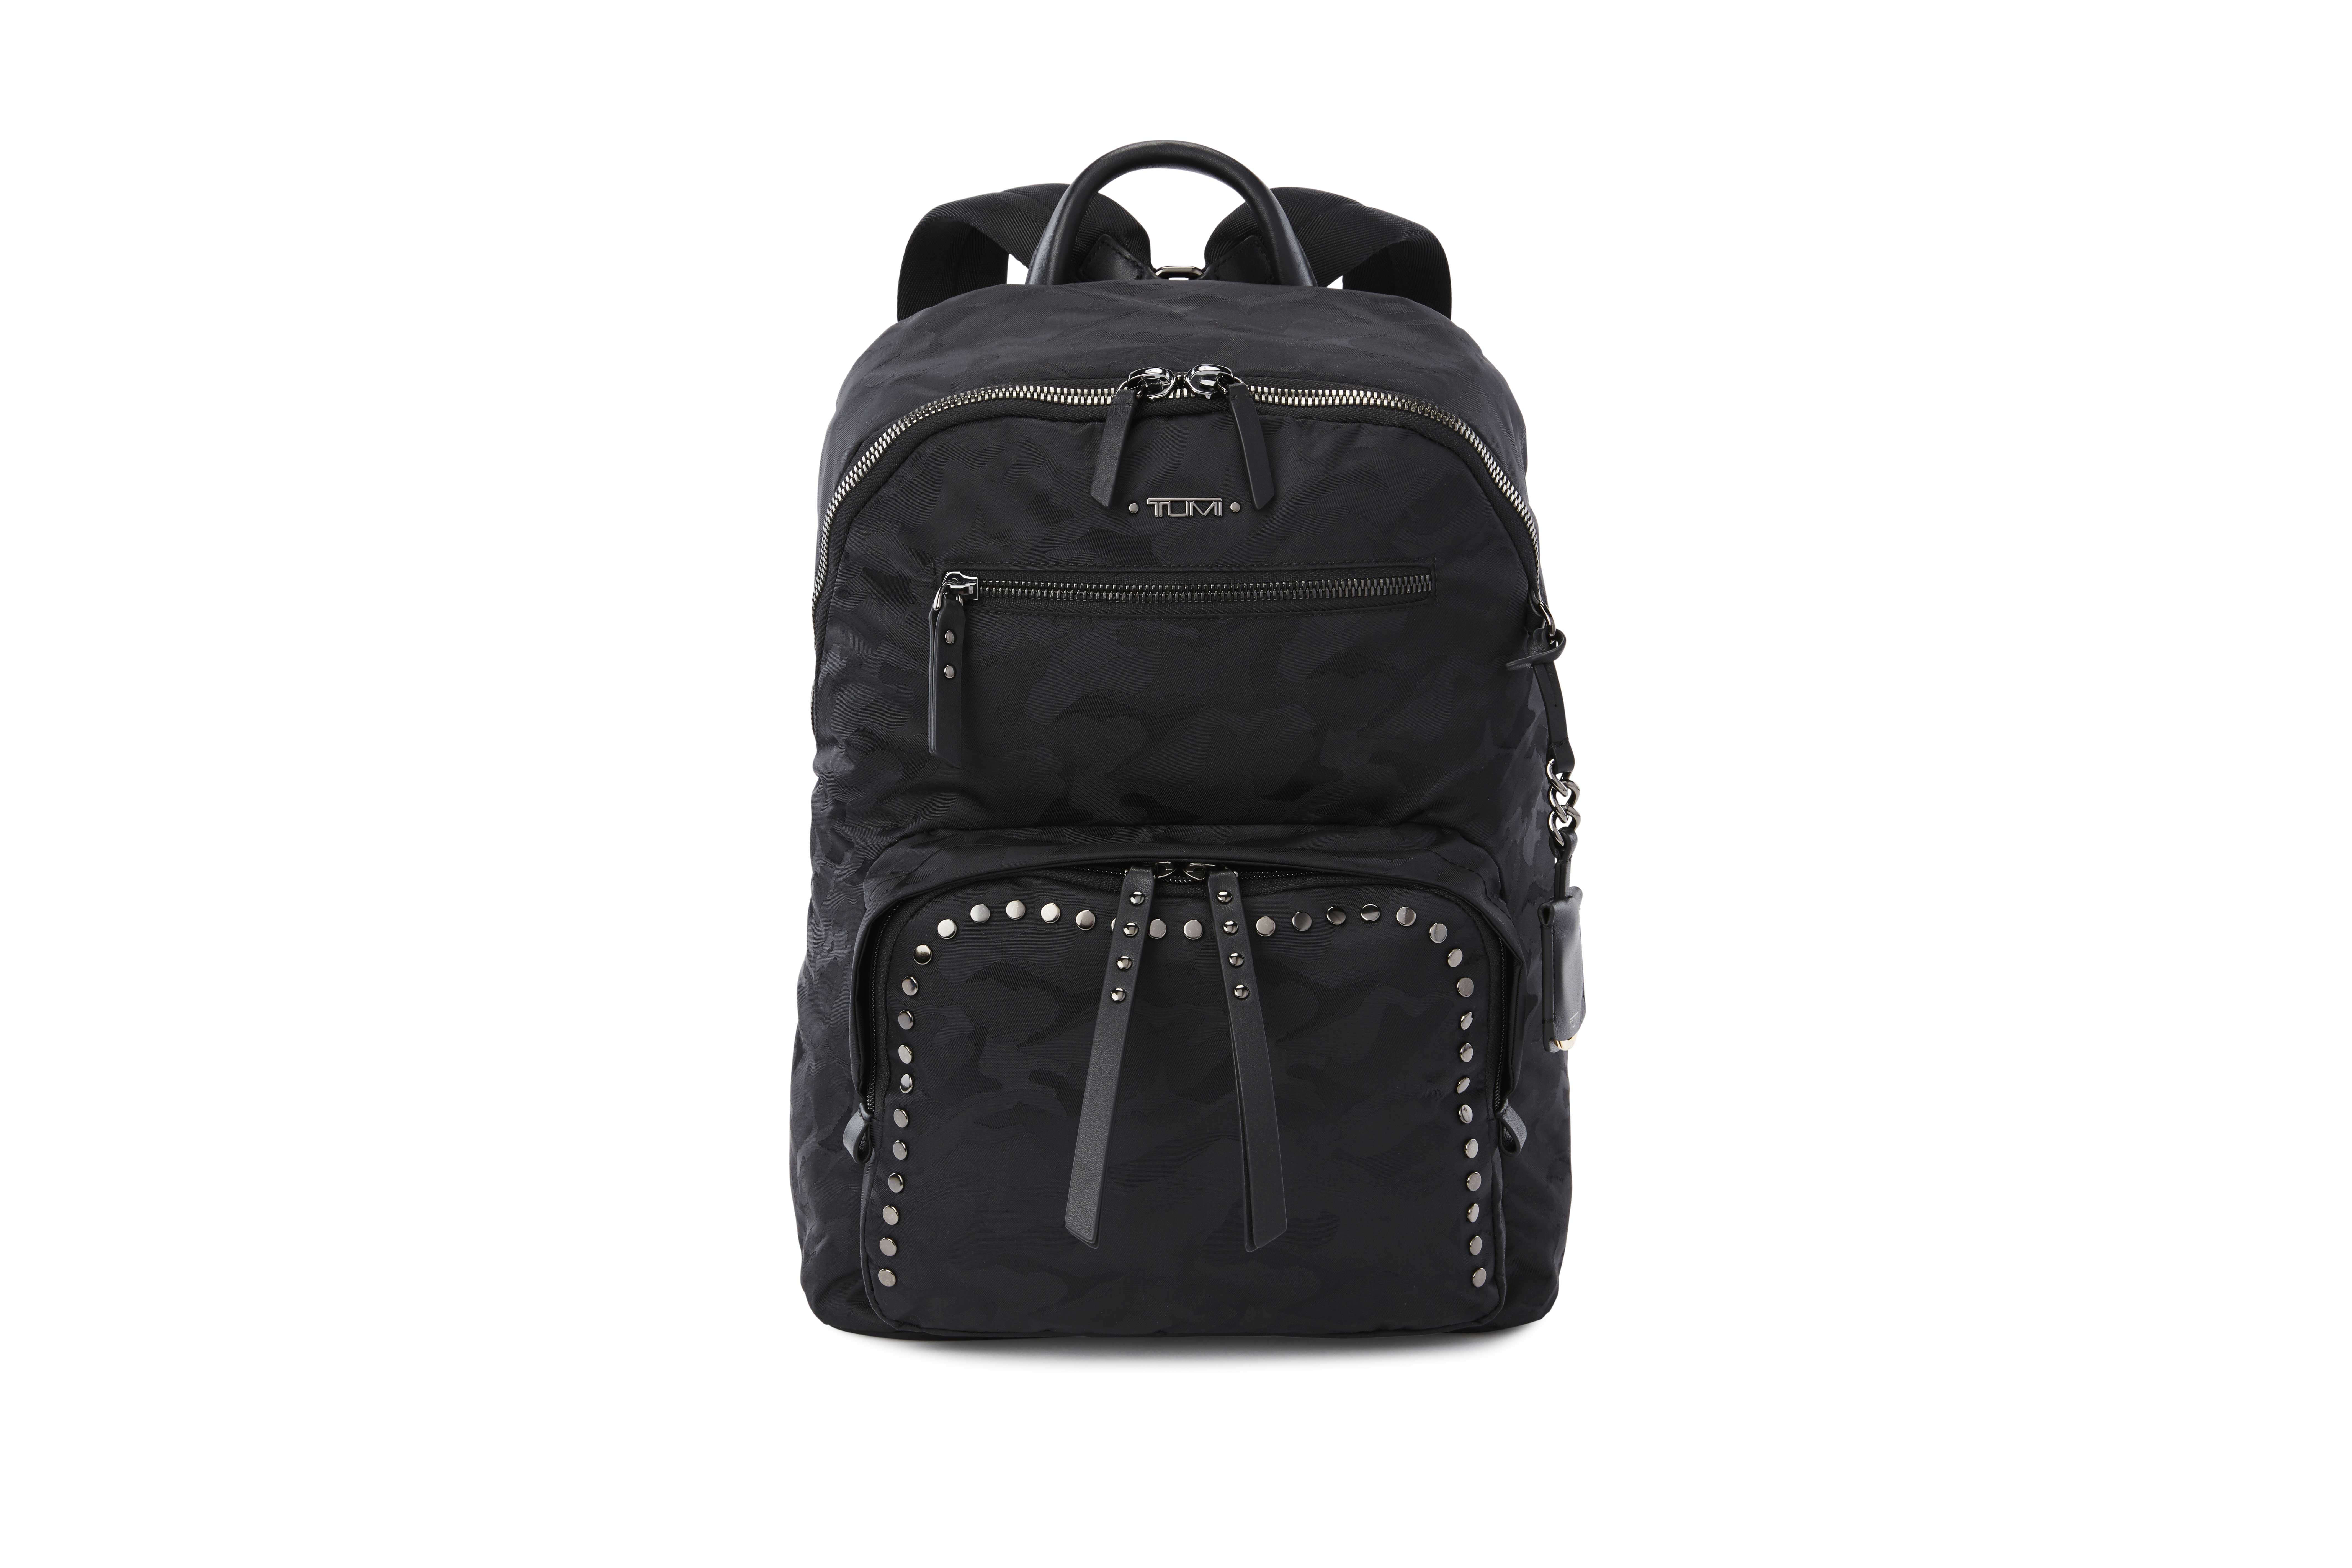 a69d56ed6 TUMI Voyageur Novelty Hagen Backpack - Black Camo